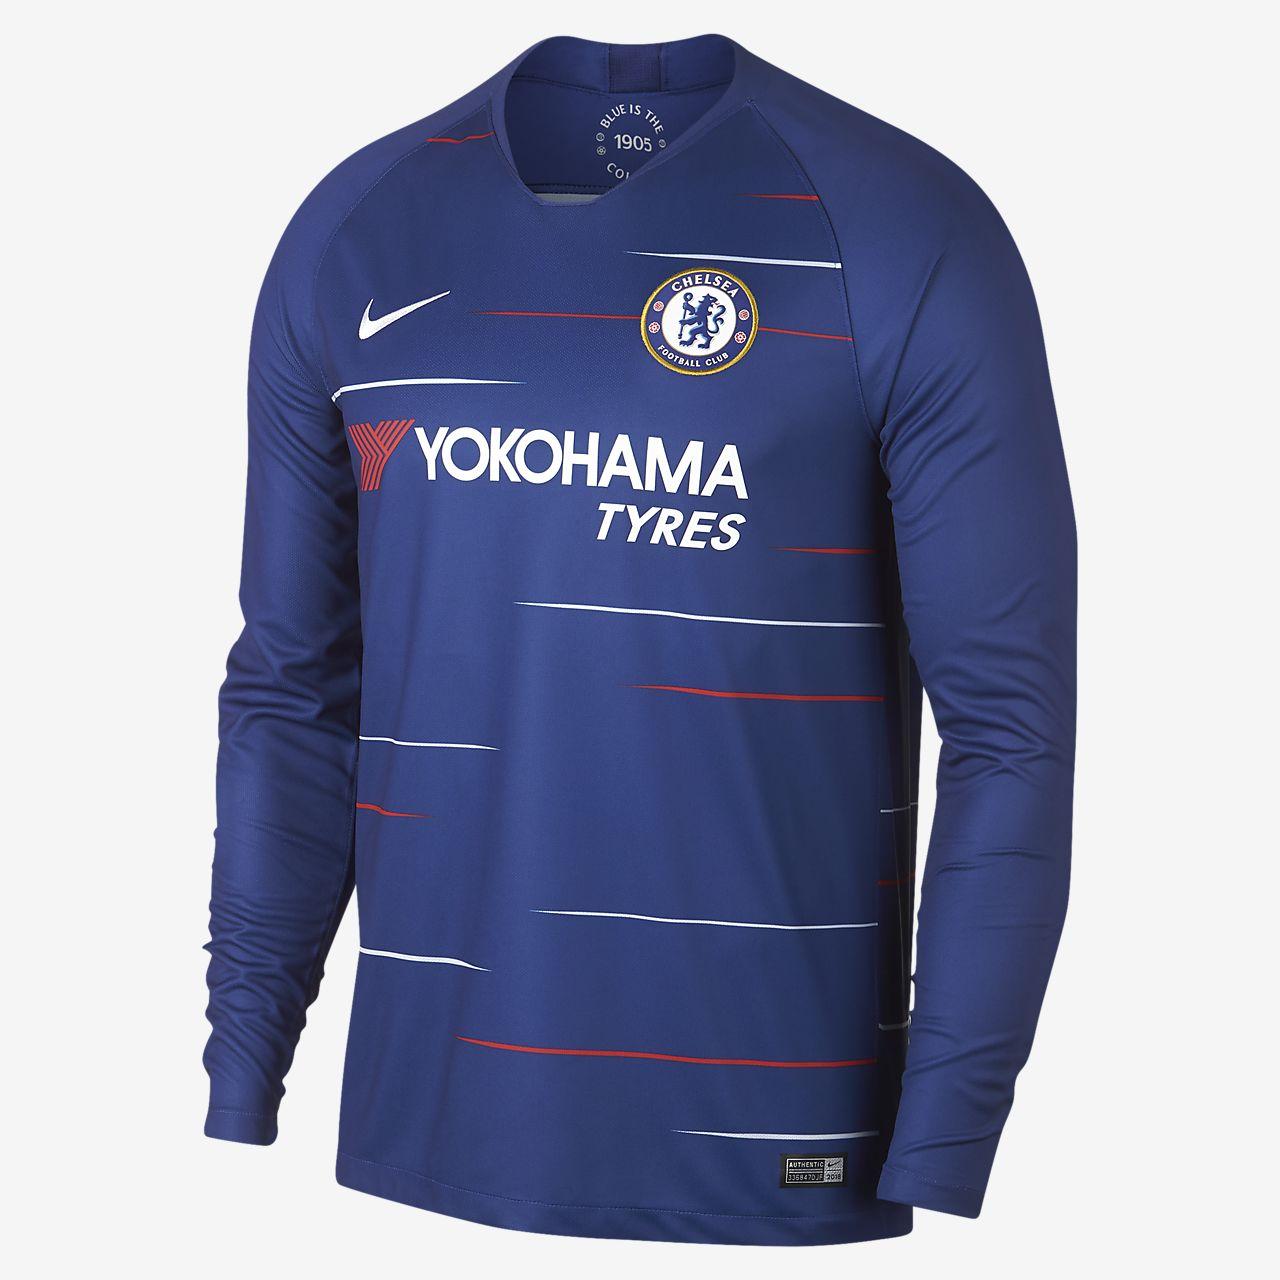 finest selection 62ea5 d1c3c ... Maglia da calcio a manica lunga 2018 19 Chelsea FC Stadium Home - Uomo